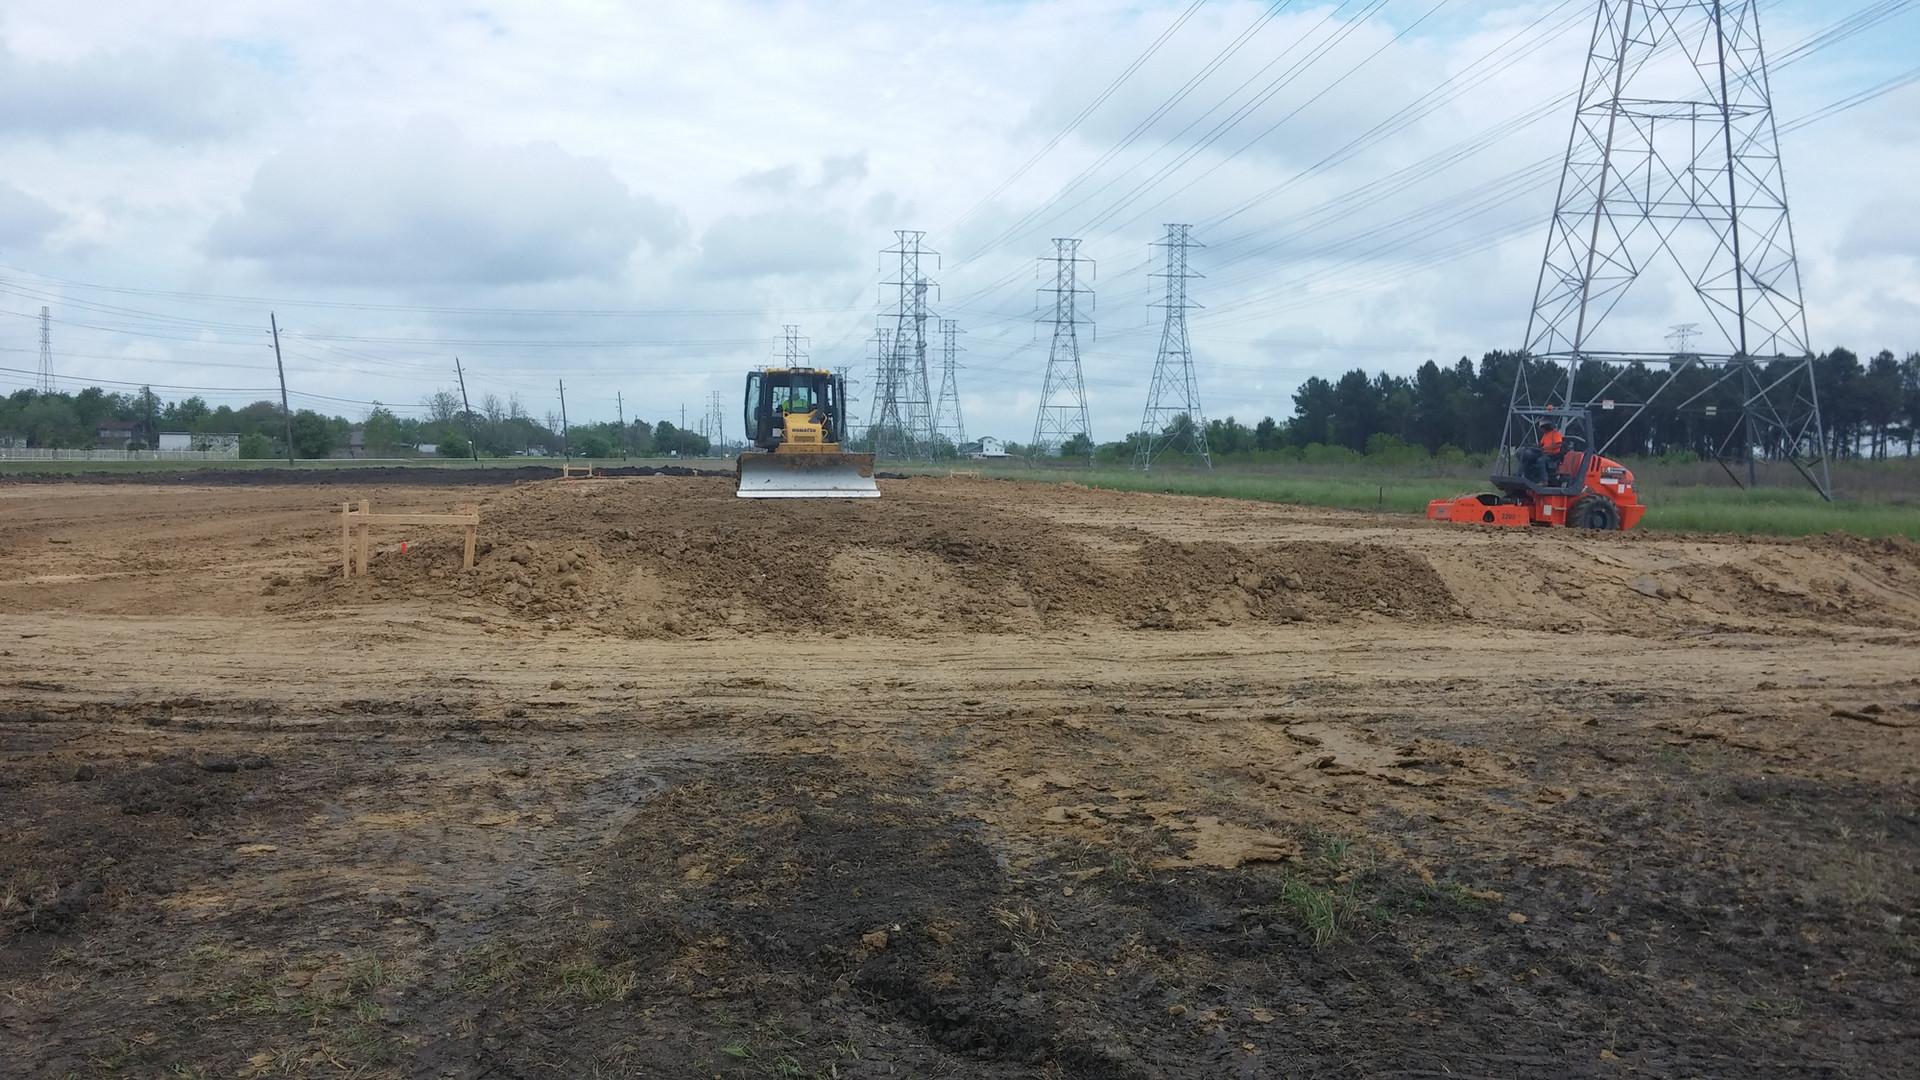 pad site with dozer